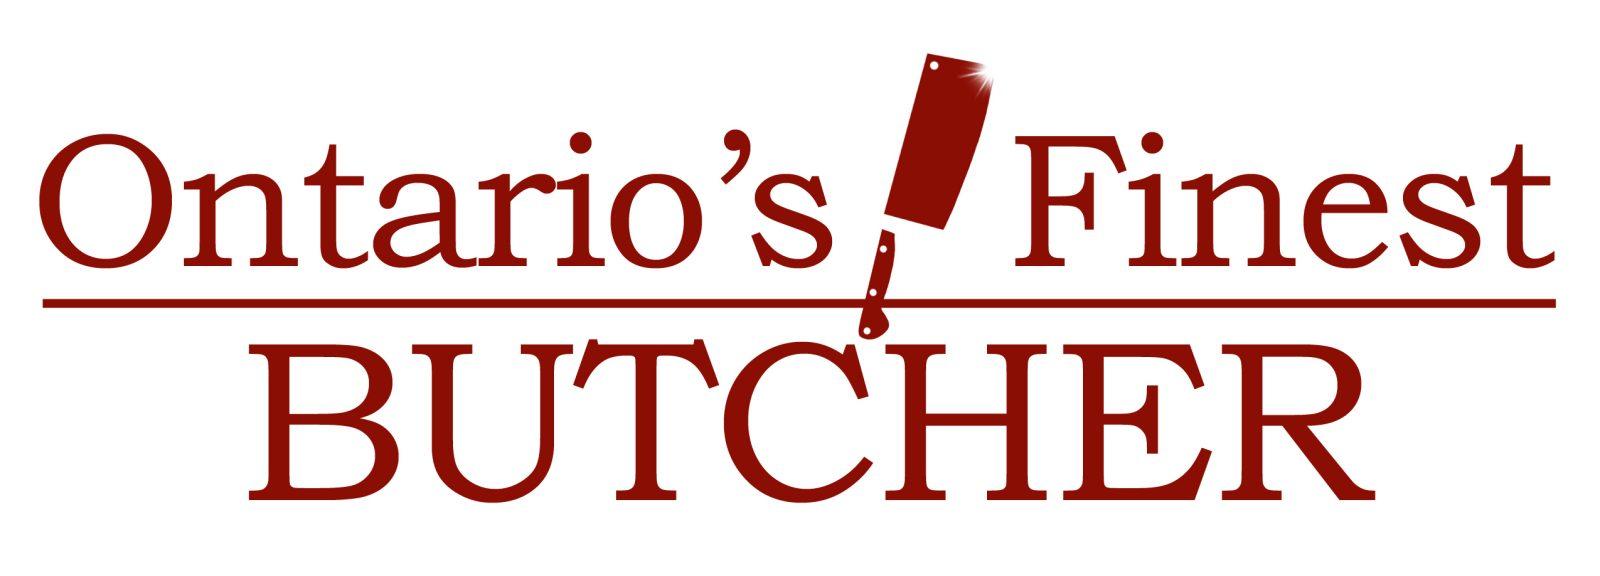 Ontario's Finest Butcher logo